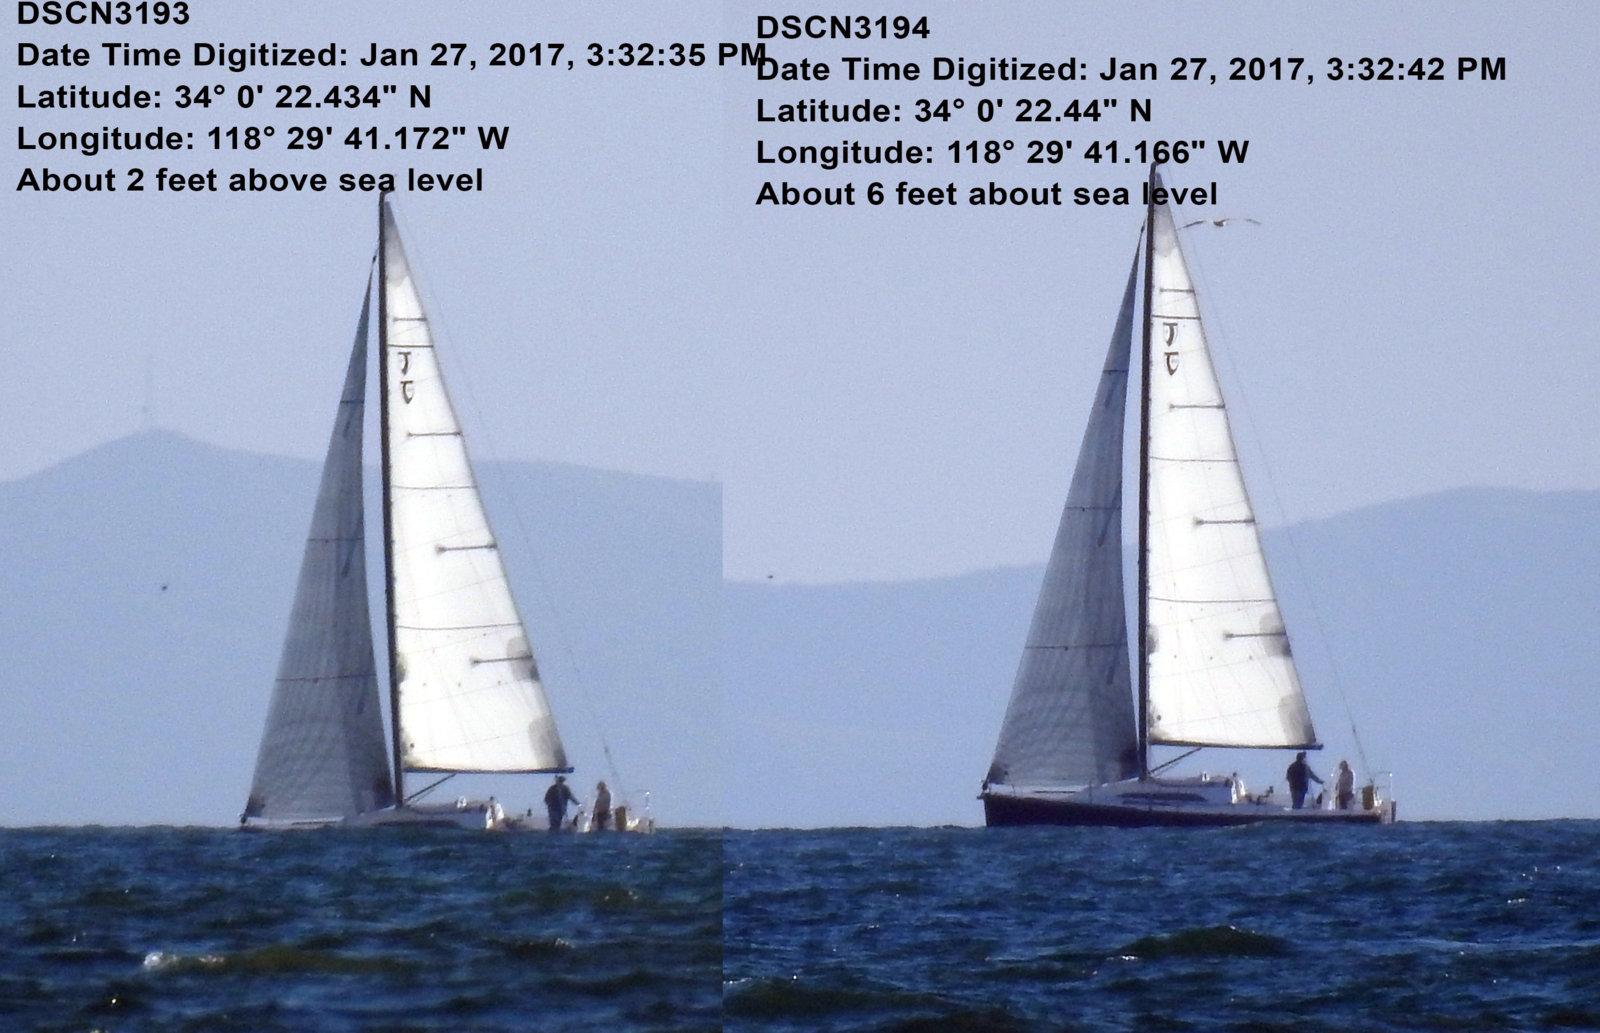 DSCN3193-comparison.jpg